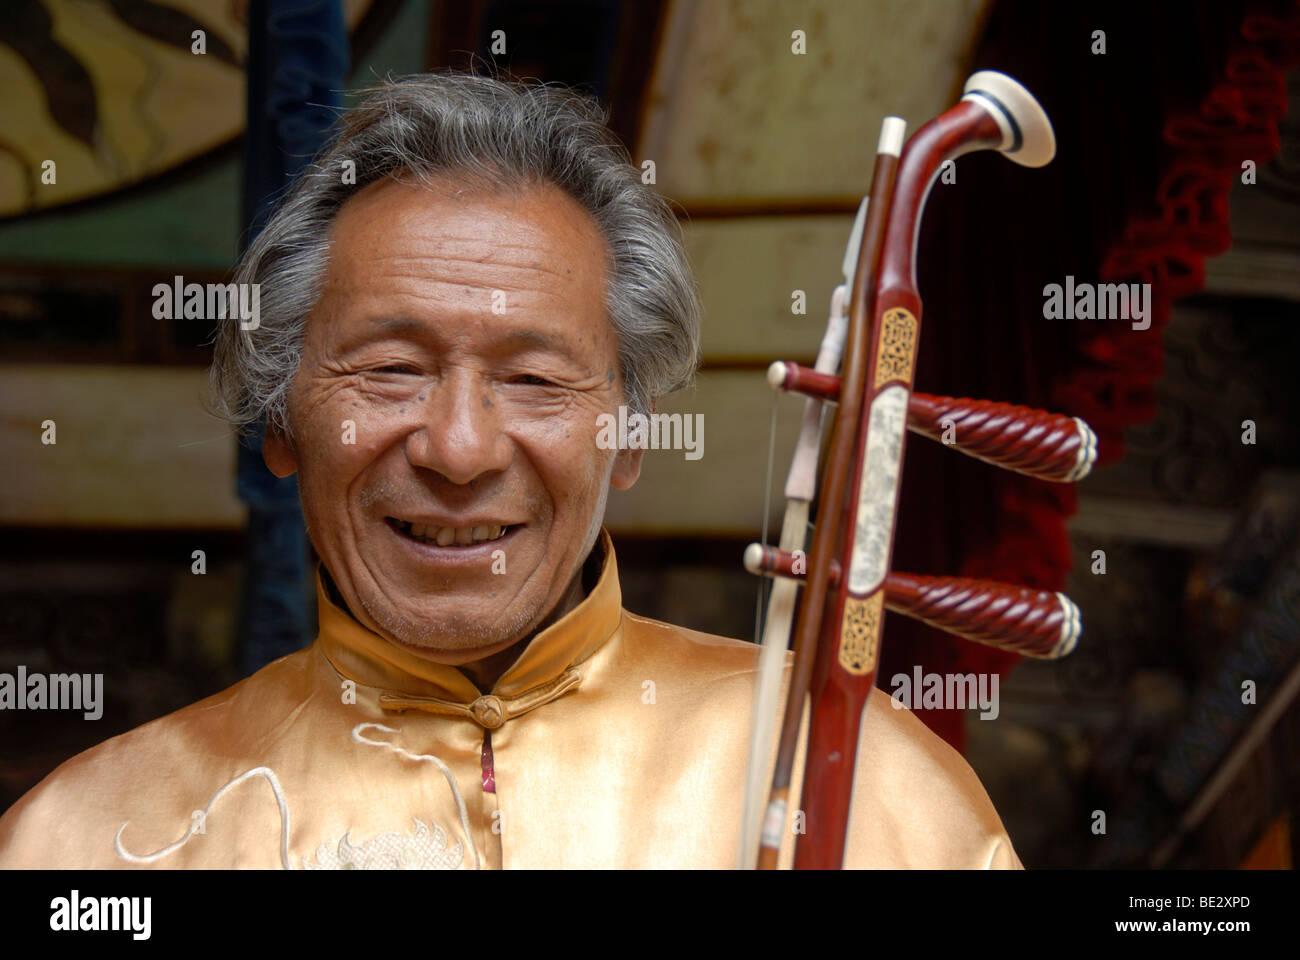 Portrait, smiling Naxi musician, Nakhi, man with string instrument, Lijiang, UNESCO World Heritage Site, Yunnan - Stock Image